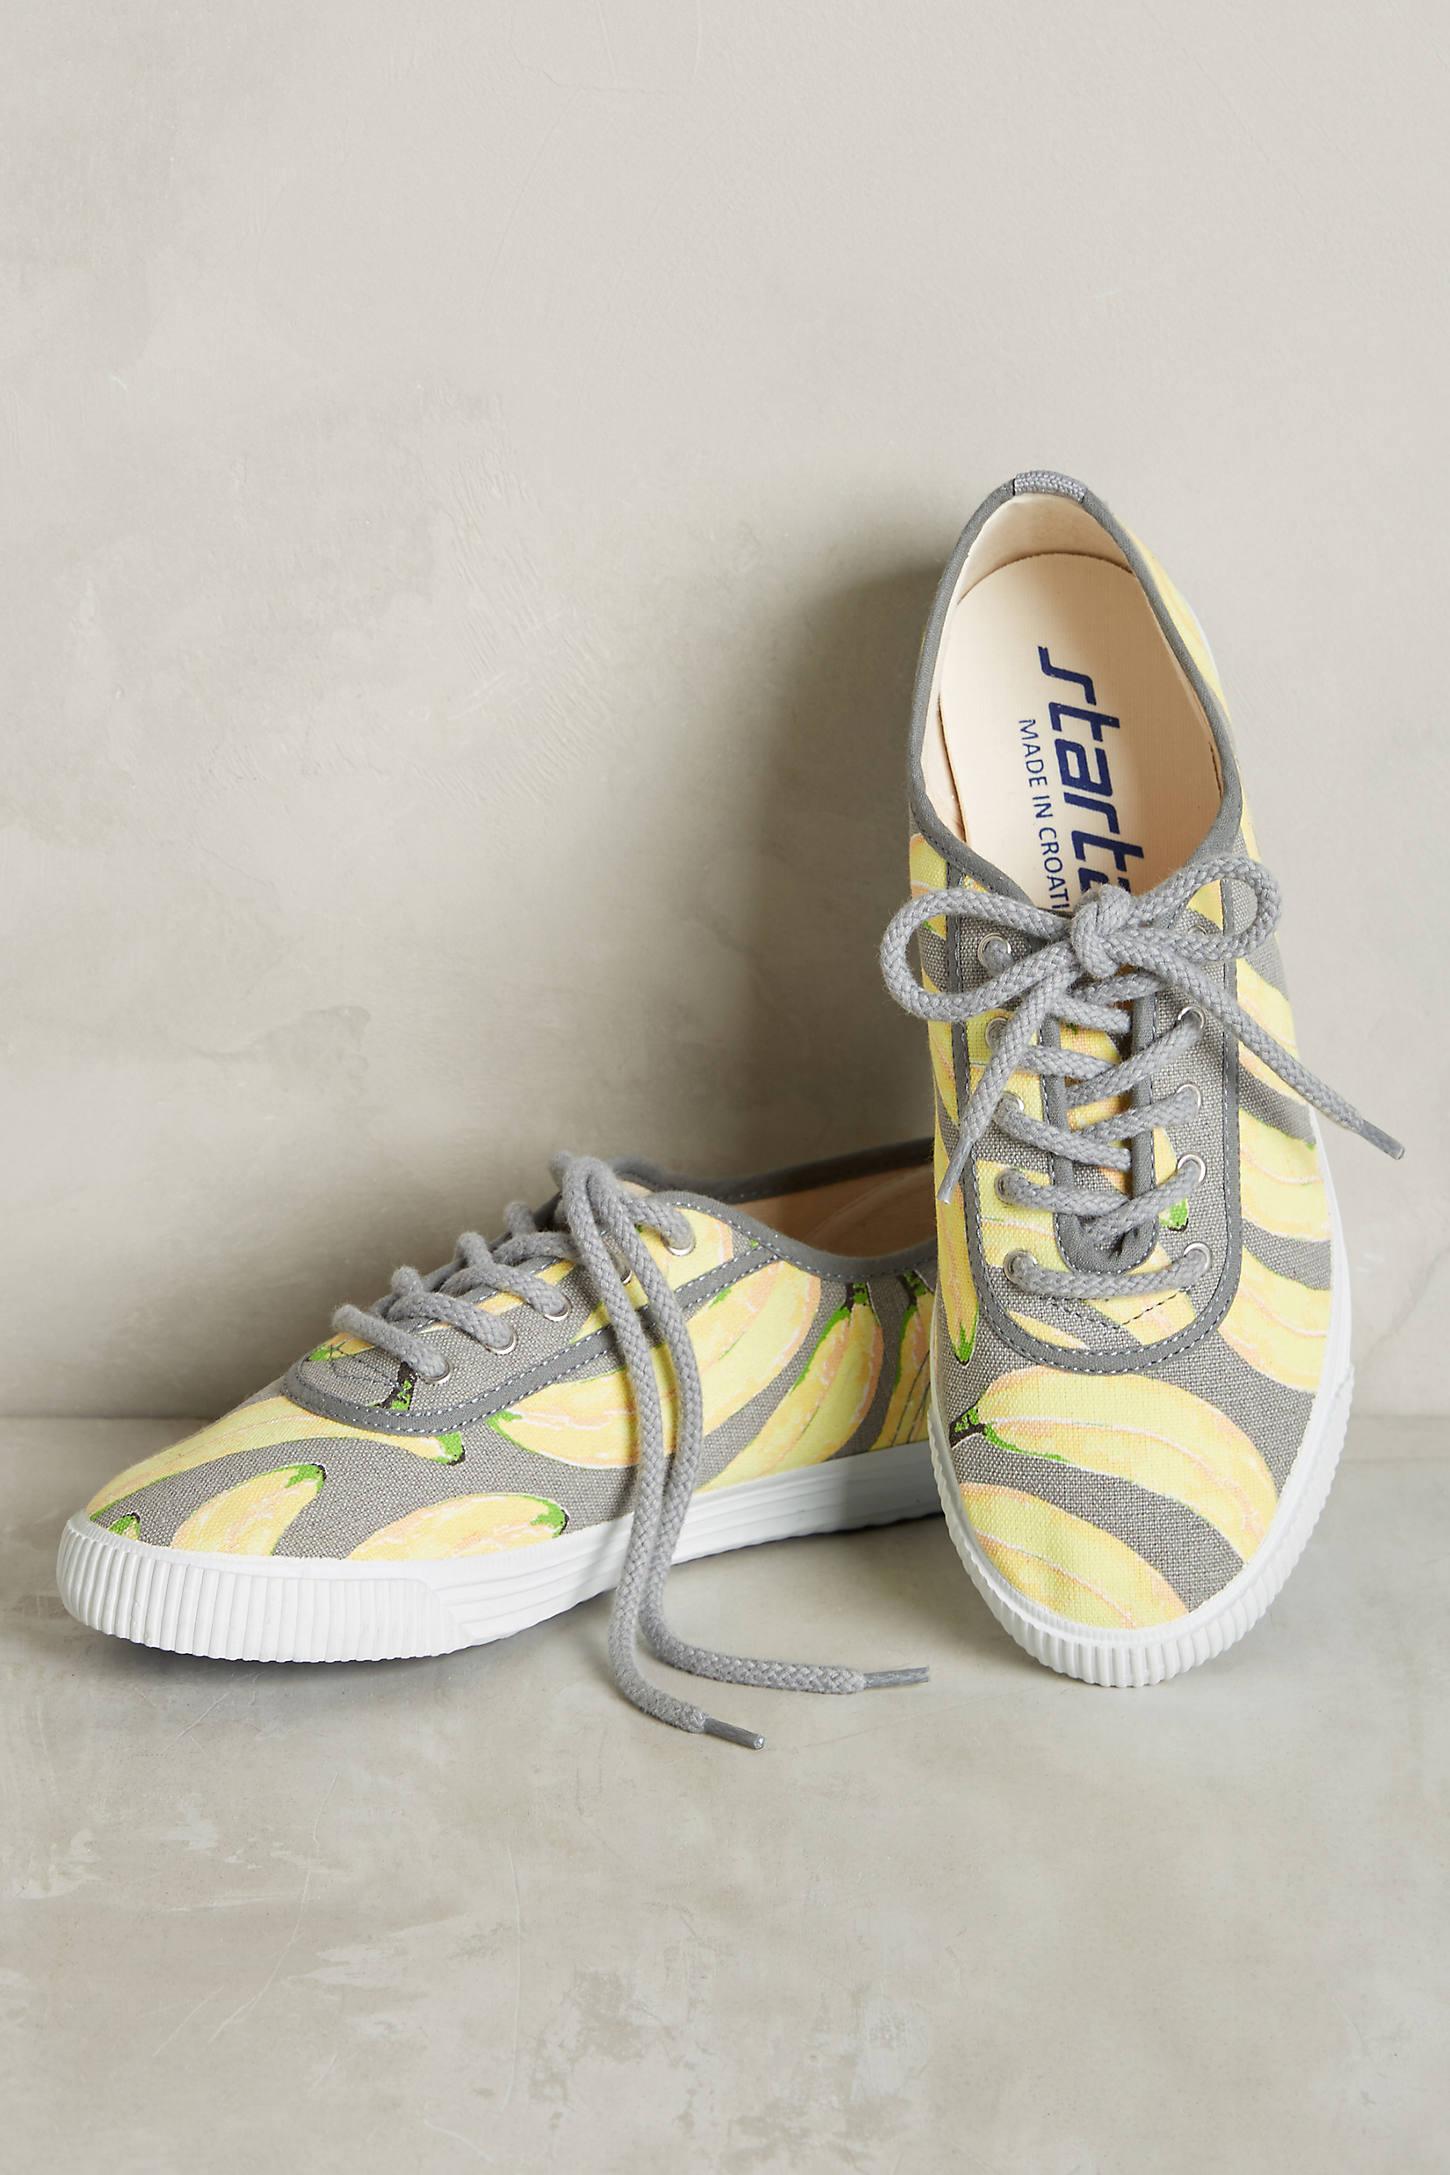 Startas Banana Sneakers